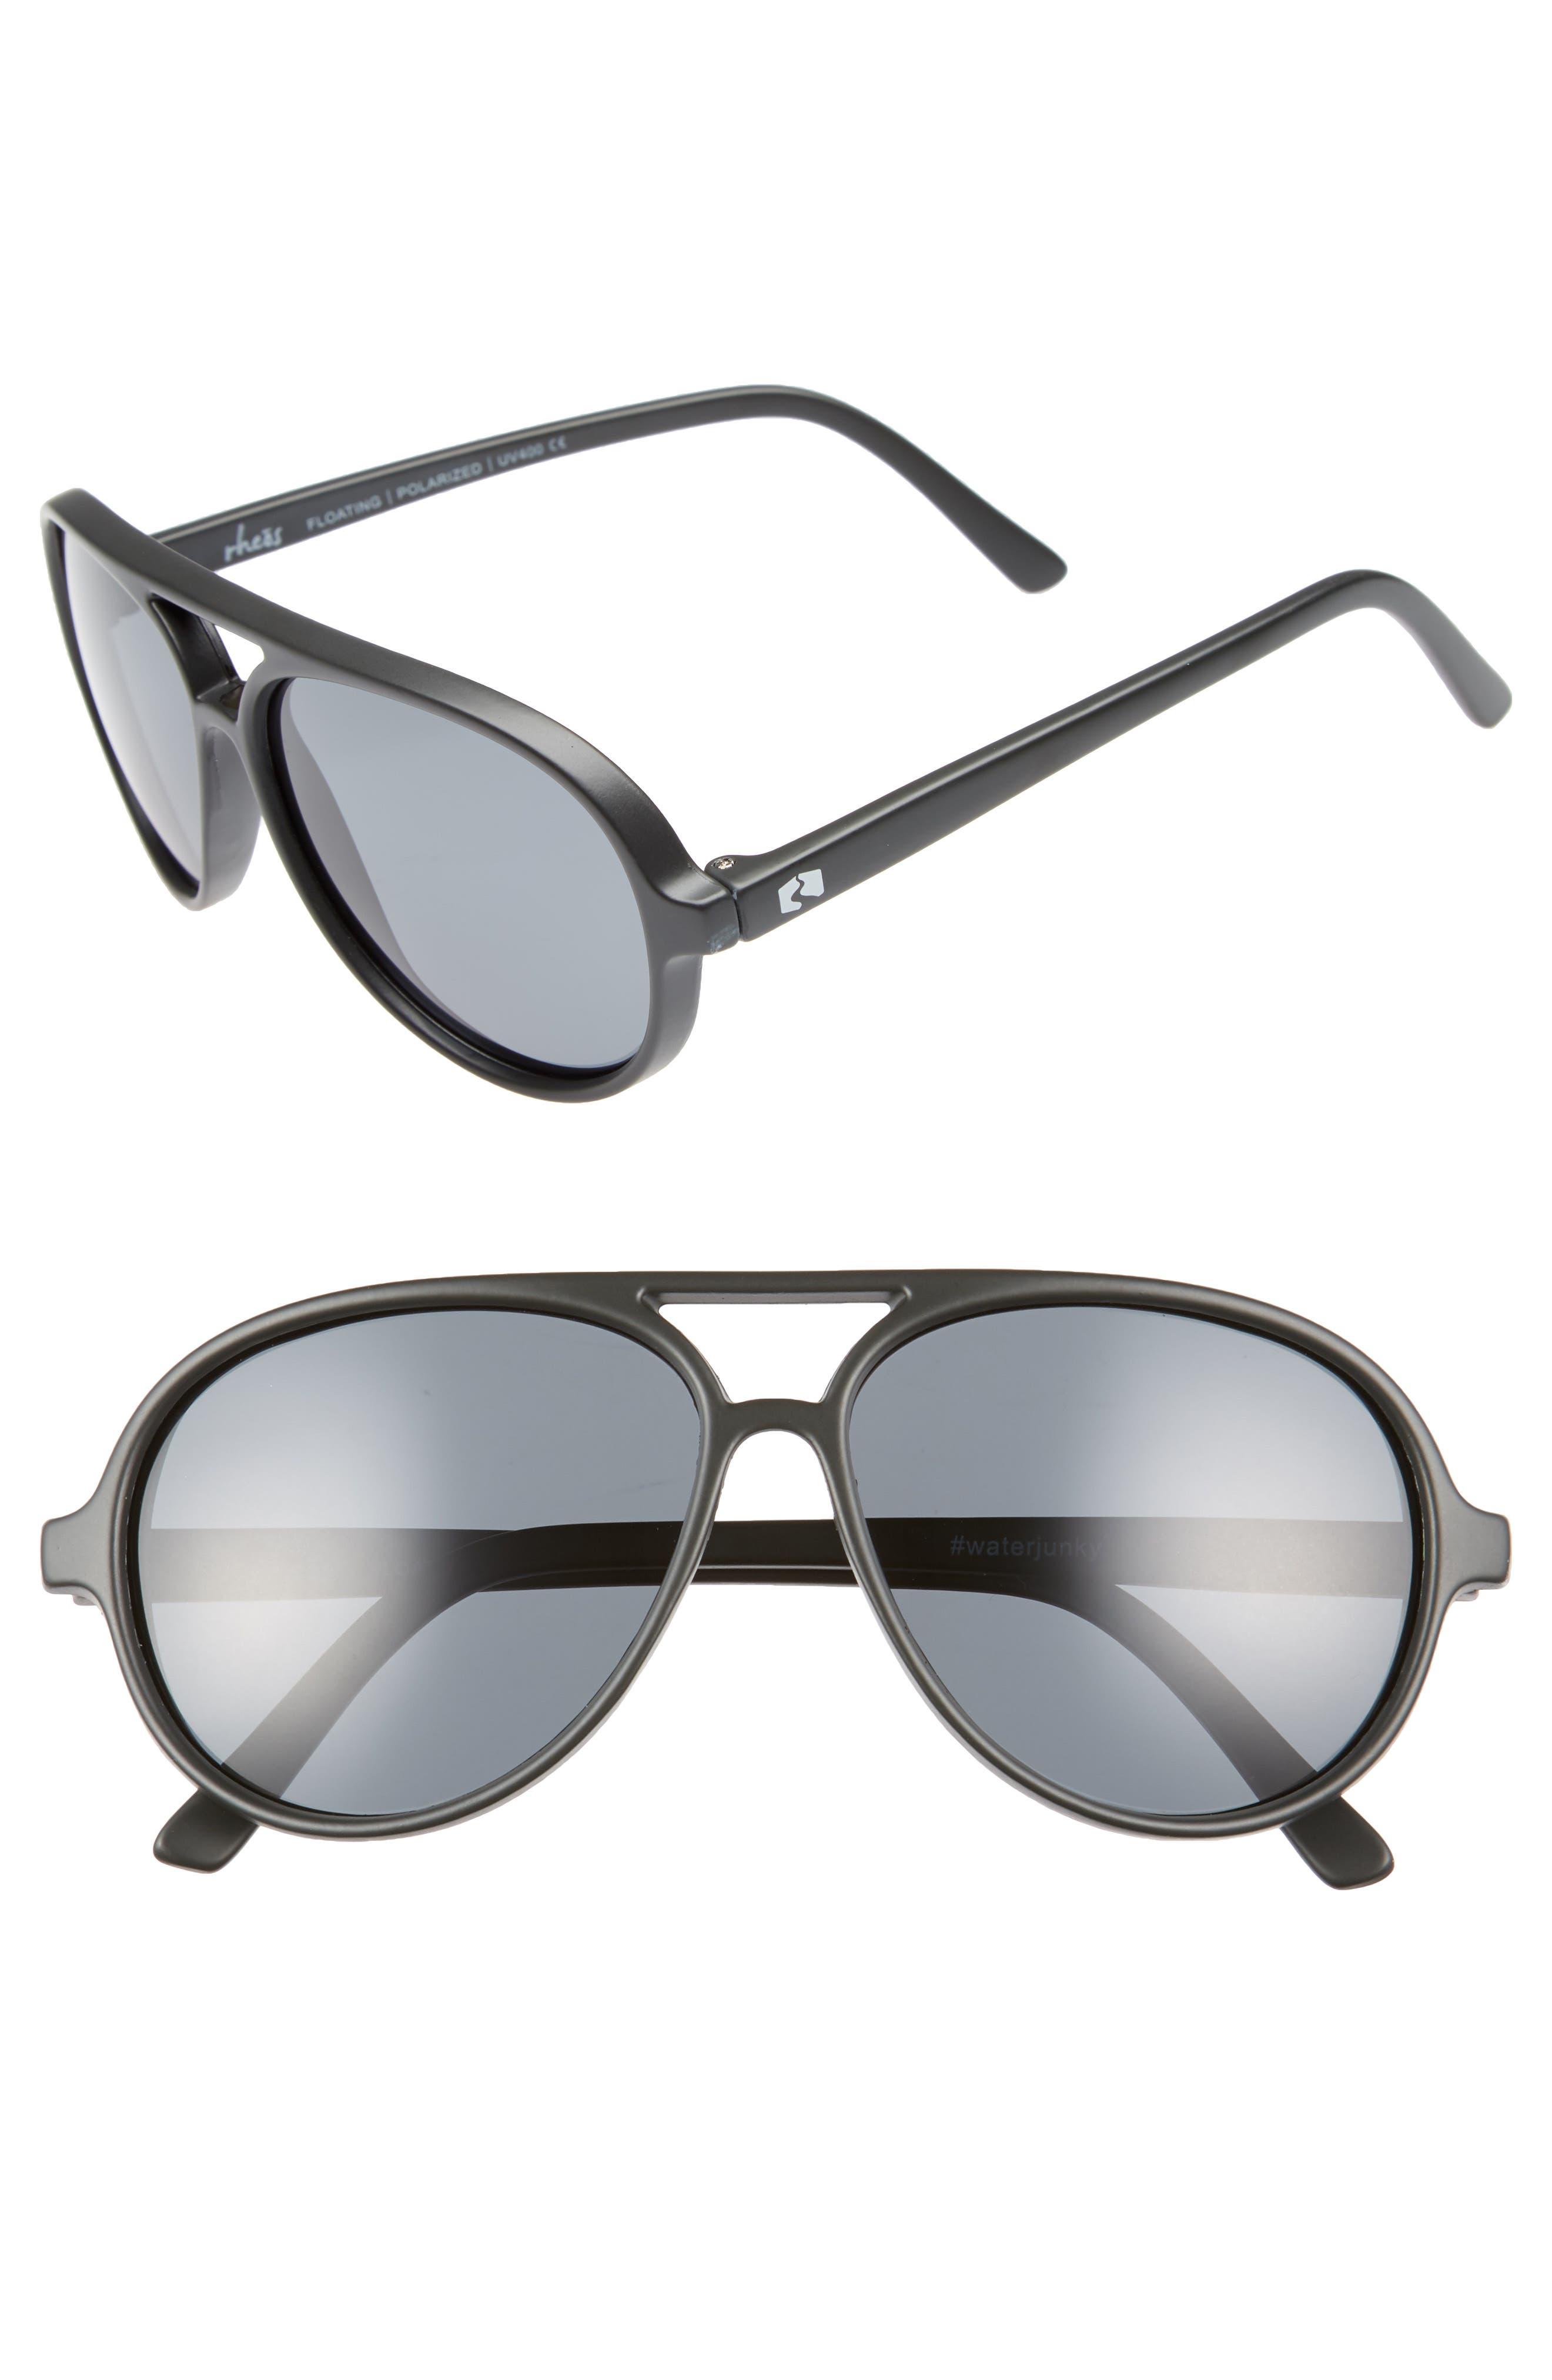 Rheos Palmettos Floating 60mm Polarized Aviator Sunglasses